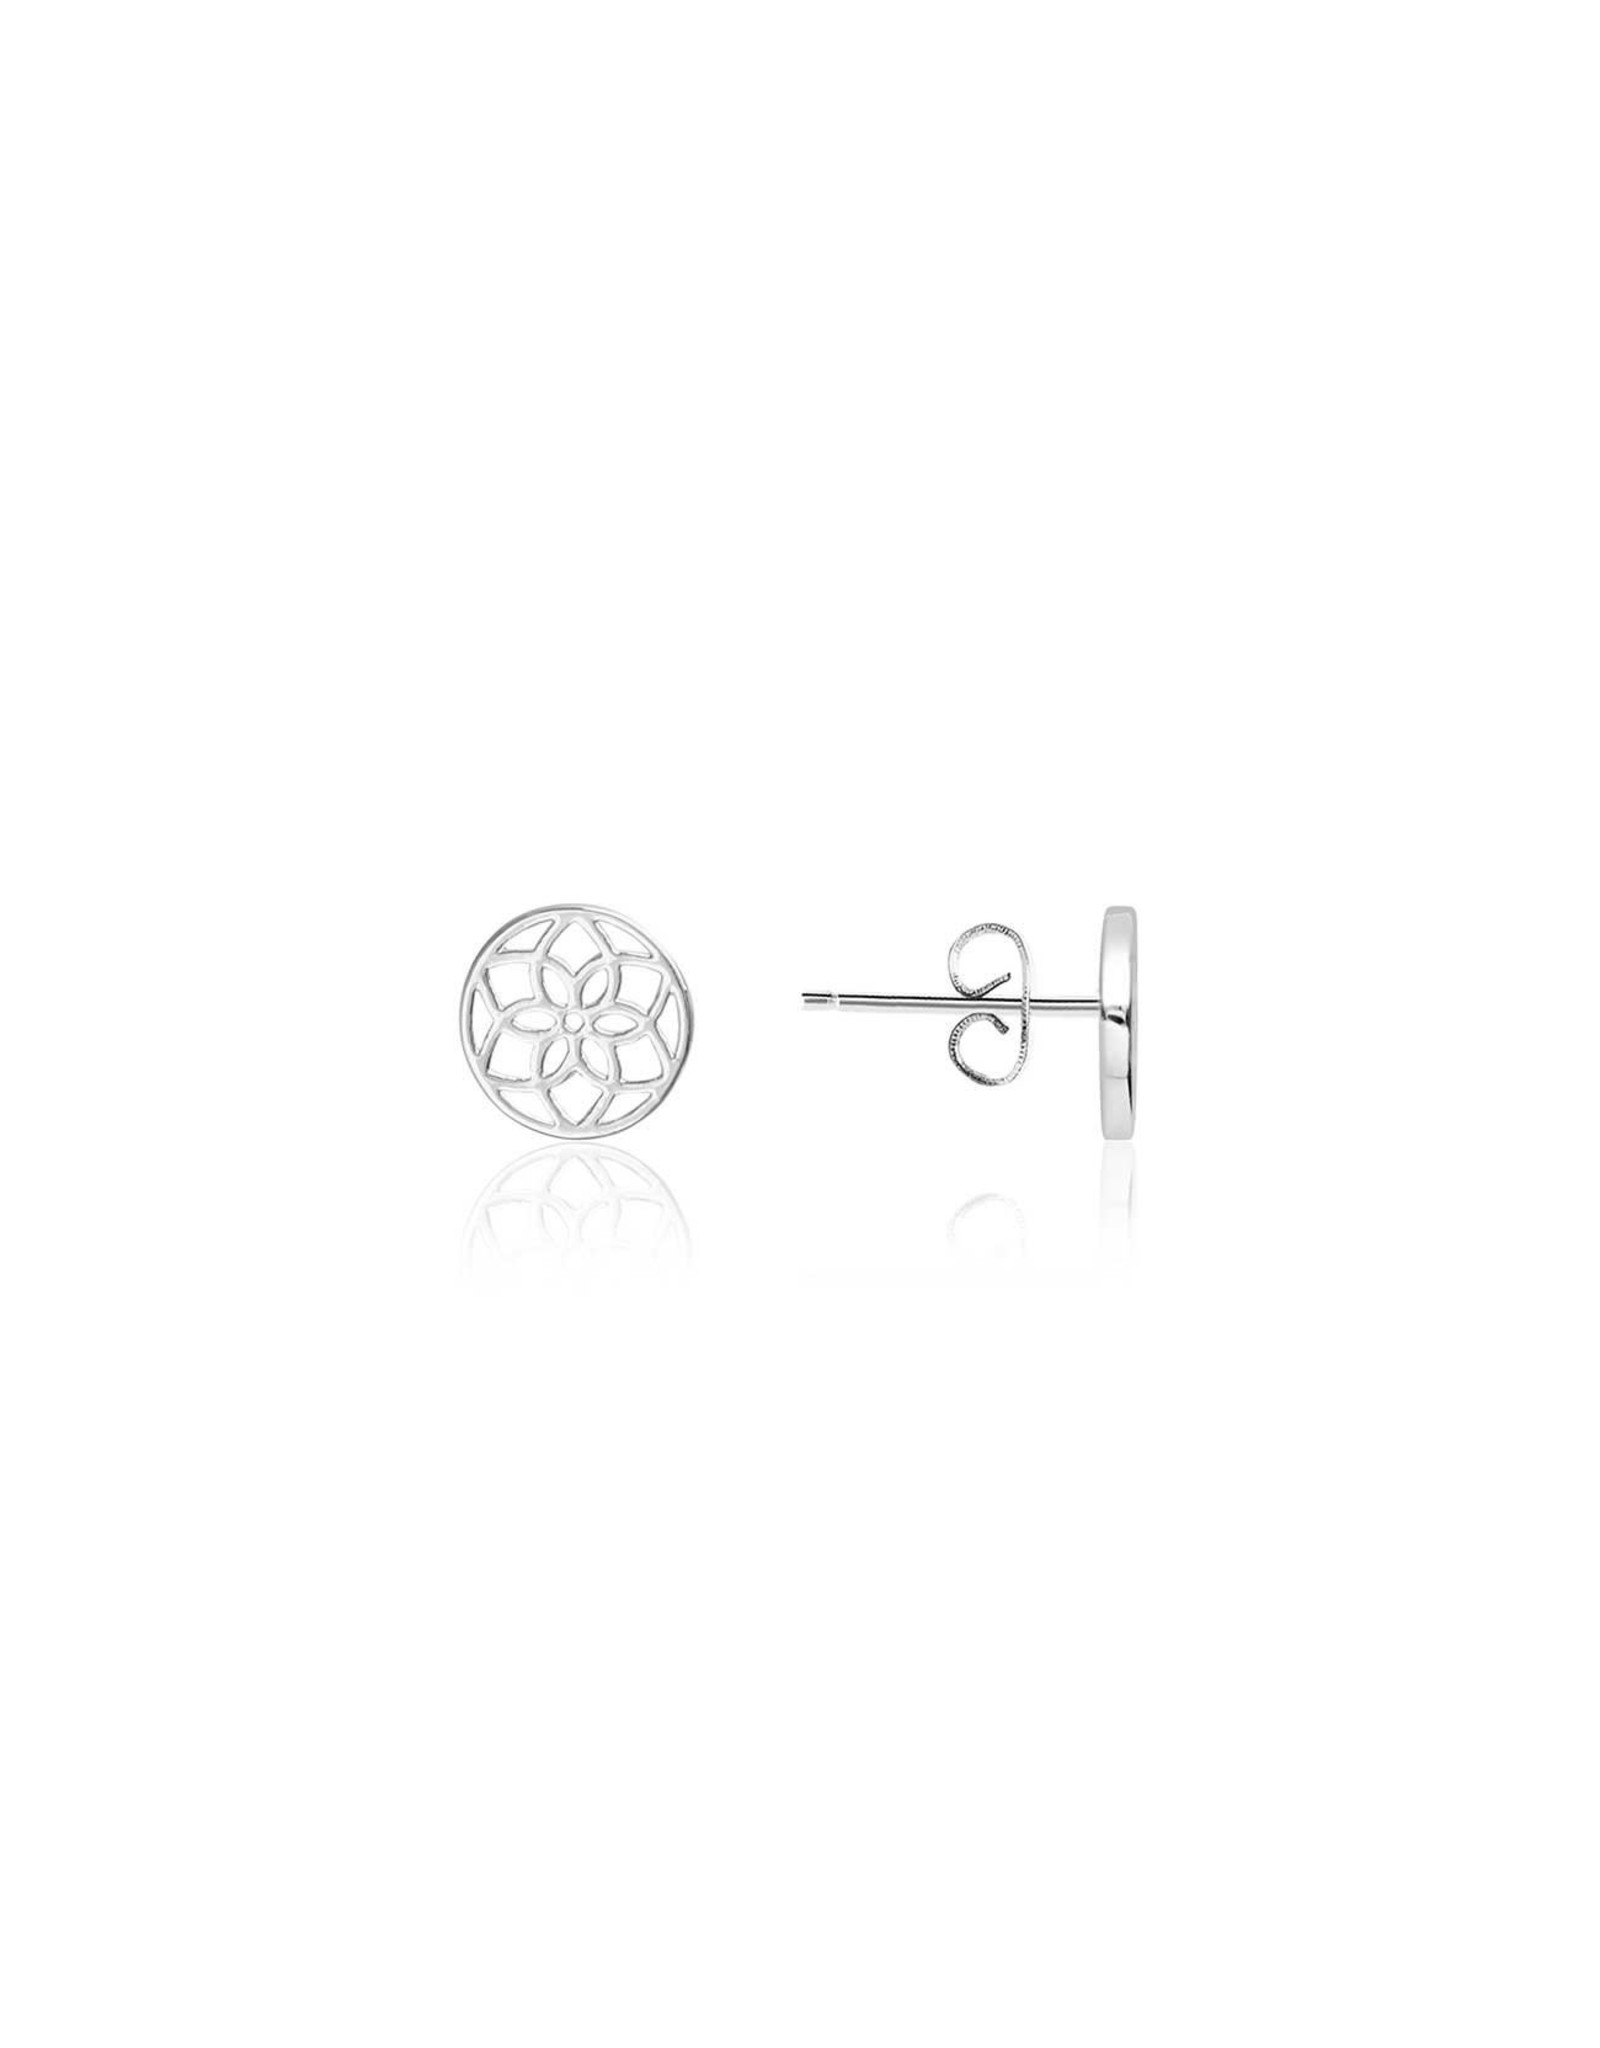 Joma Jewellery Treasure the Little Things Oorbellen - Happiness